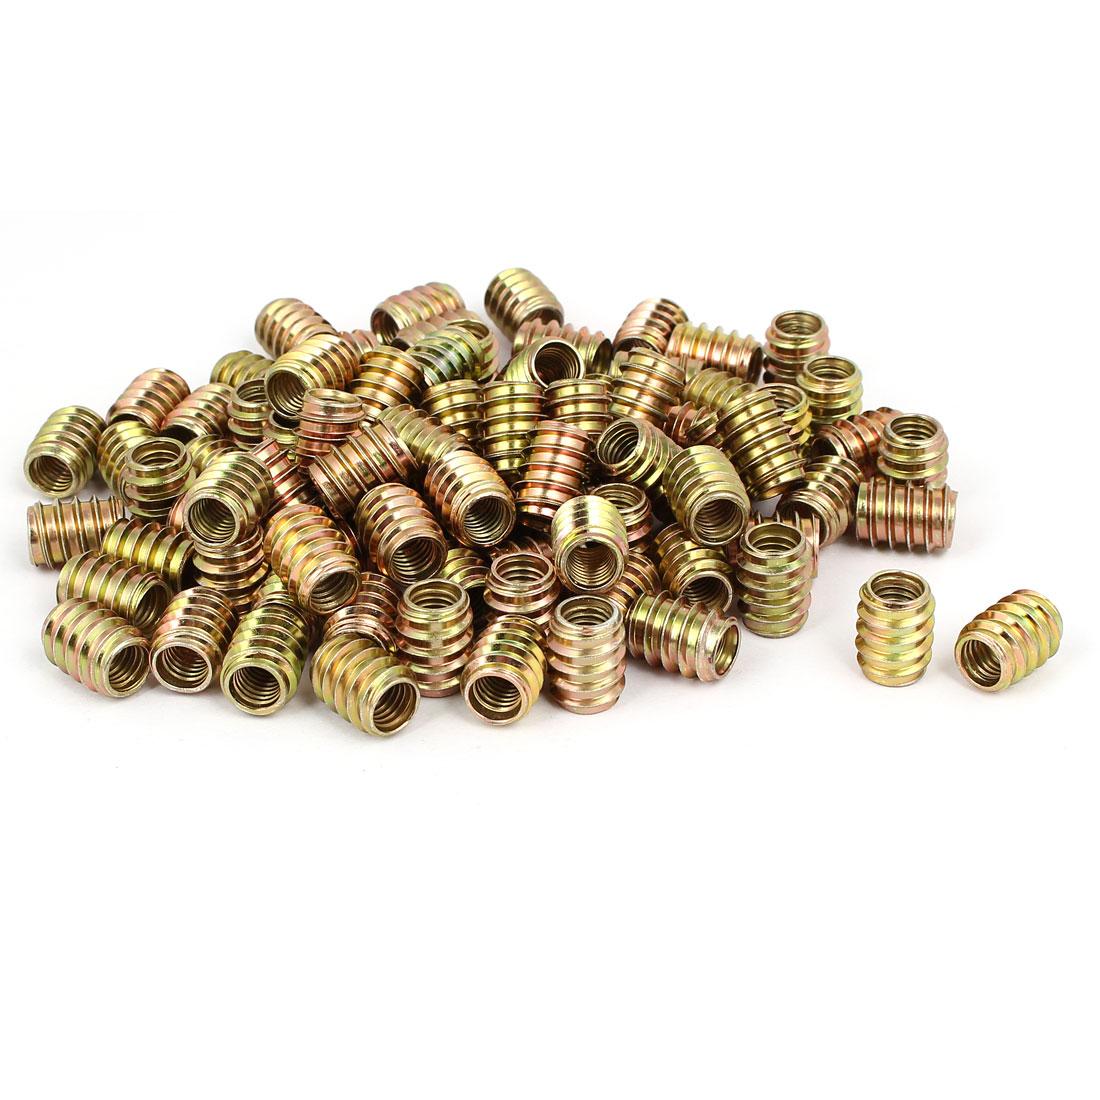 Wood Furniture Insert Screw E-Nut Bronze Tone M8 x 17mm 100pcs